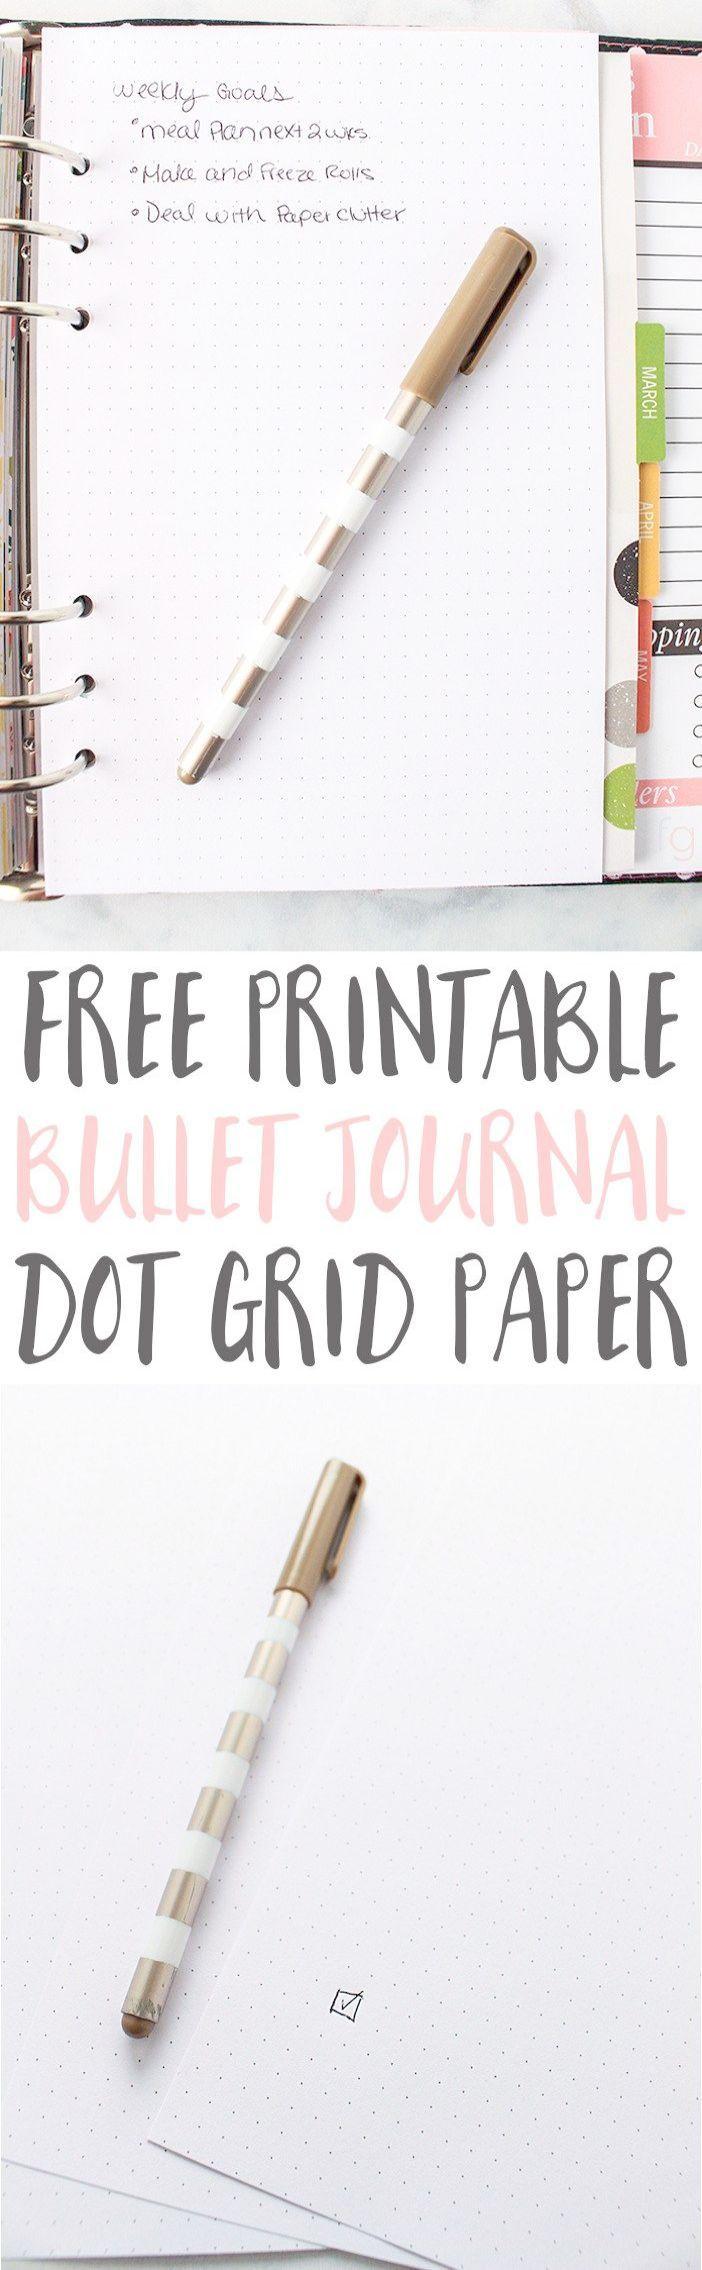 Crafting And Building Original His Hidden Crafting Table Mumbo Jumbo Our Crafting And Buildi Bullet Journal Paper Bullet Journal Dot Grid Bullet Journal Layout